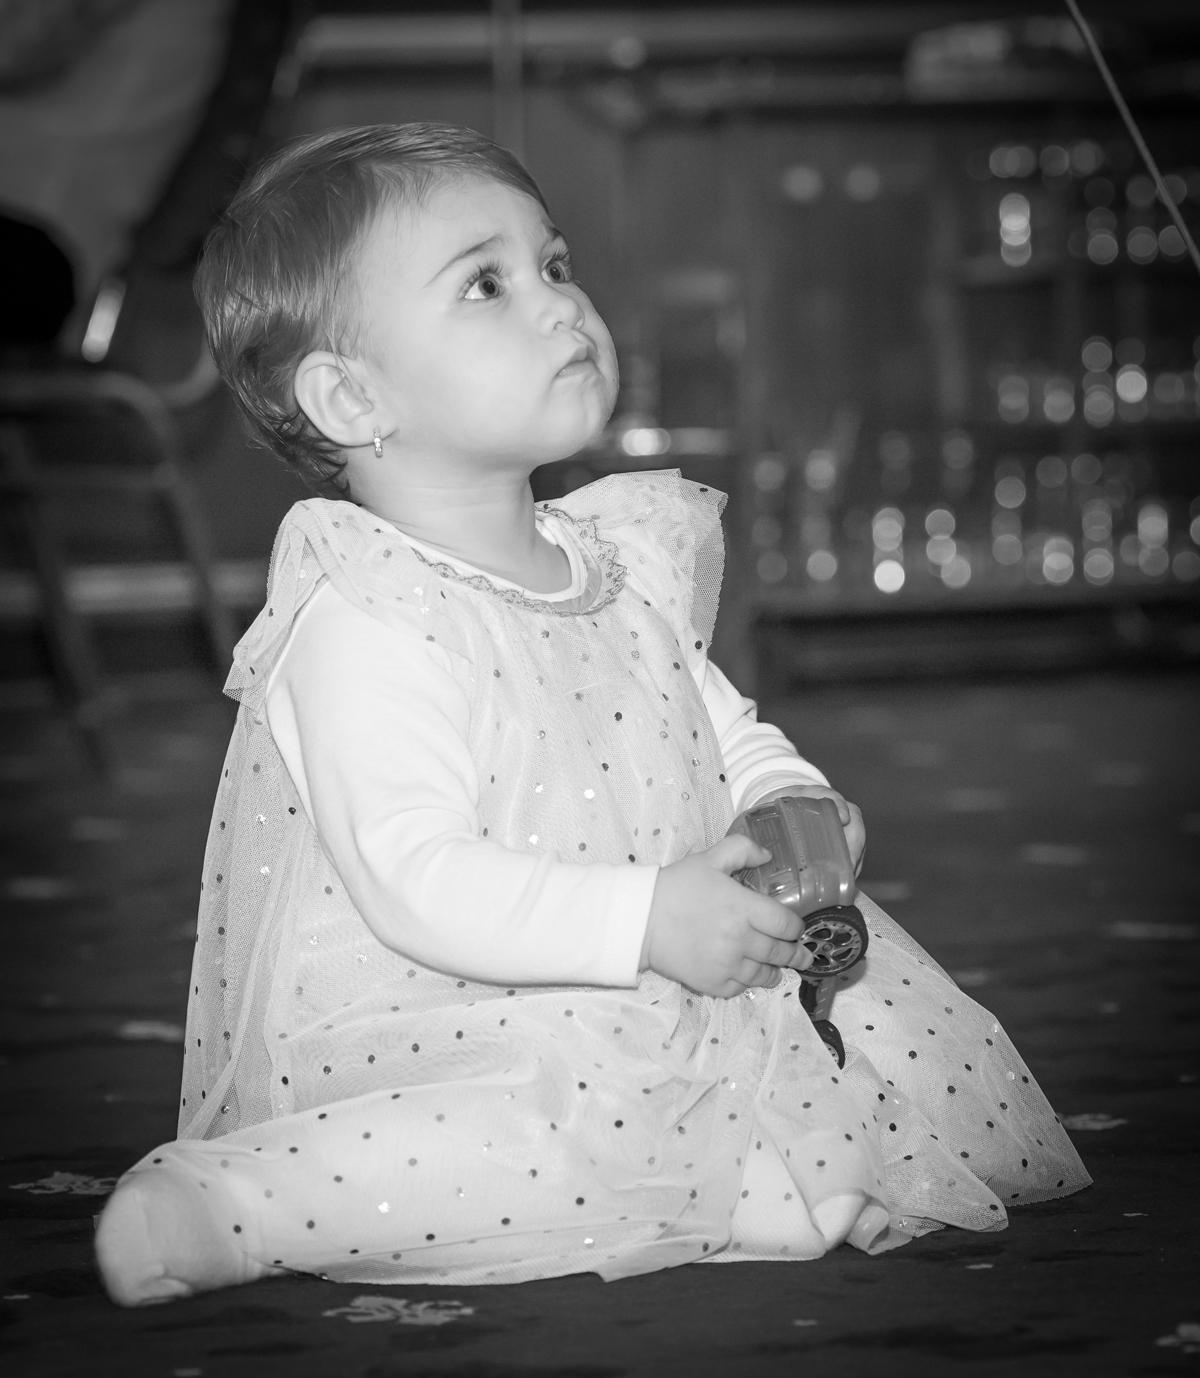 Serban-Photos.ro – Flavia Iliescu, Petrecere 1 an